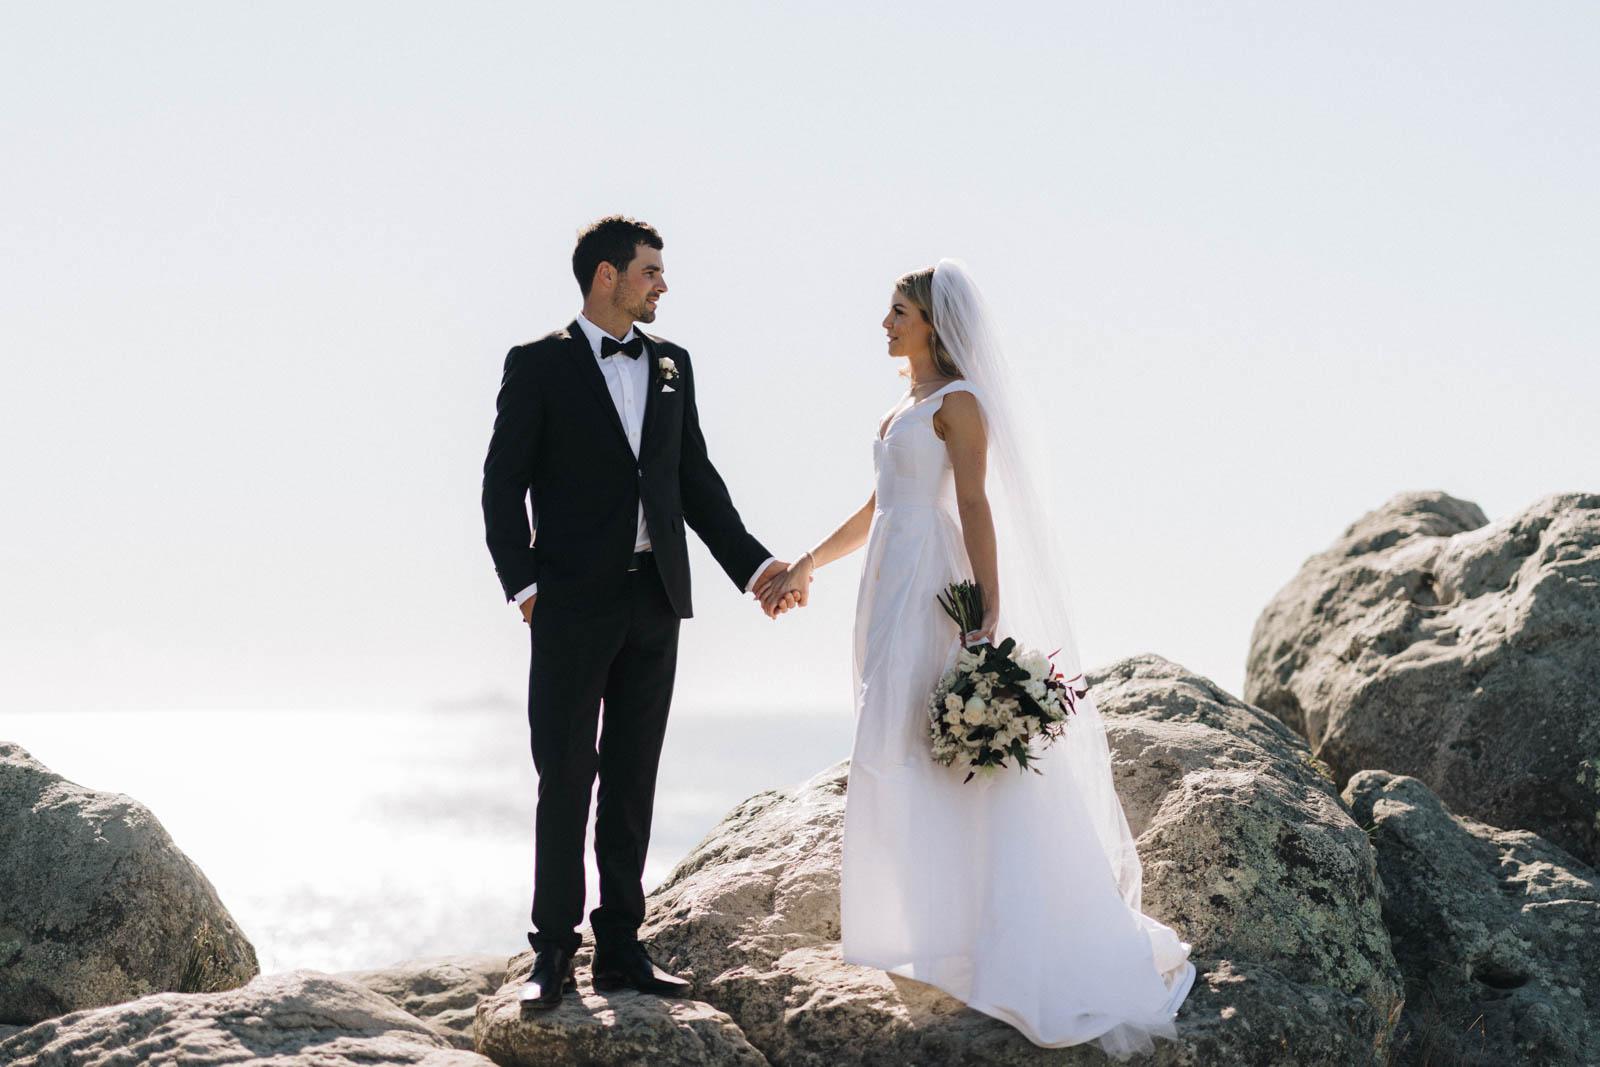 newfound-s-p-mt-maunganui-tauranga-wedding-photographer-1457-A9_04866